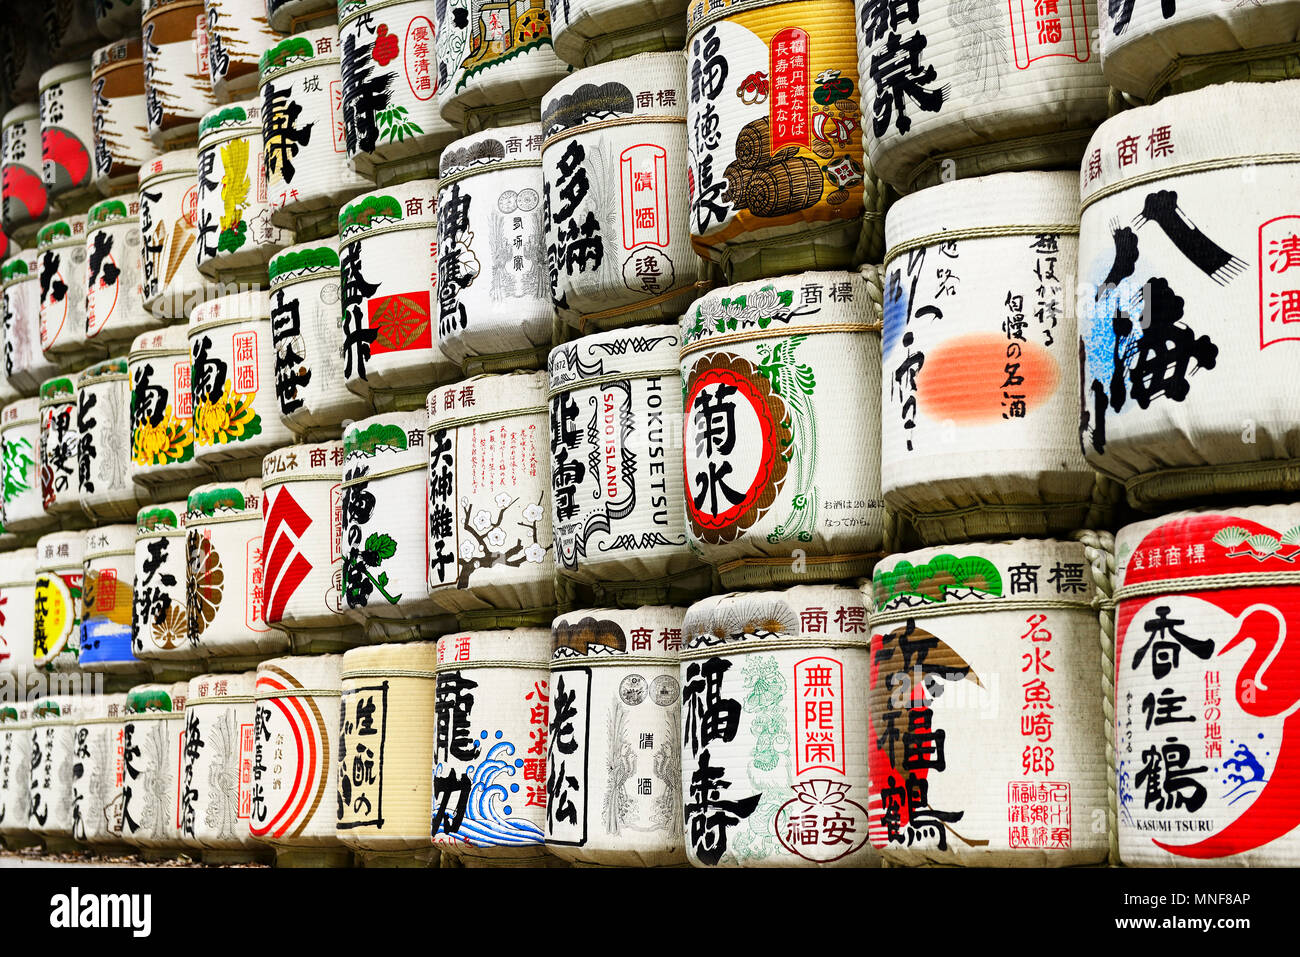 Sake barrels at Meiji-Jingu Shrine, Tokyo, Japan - Stock Image